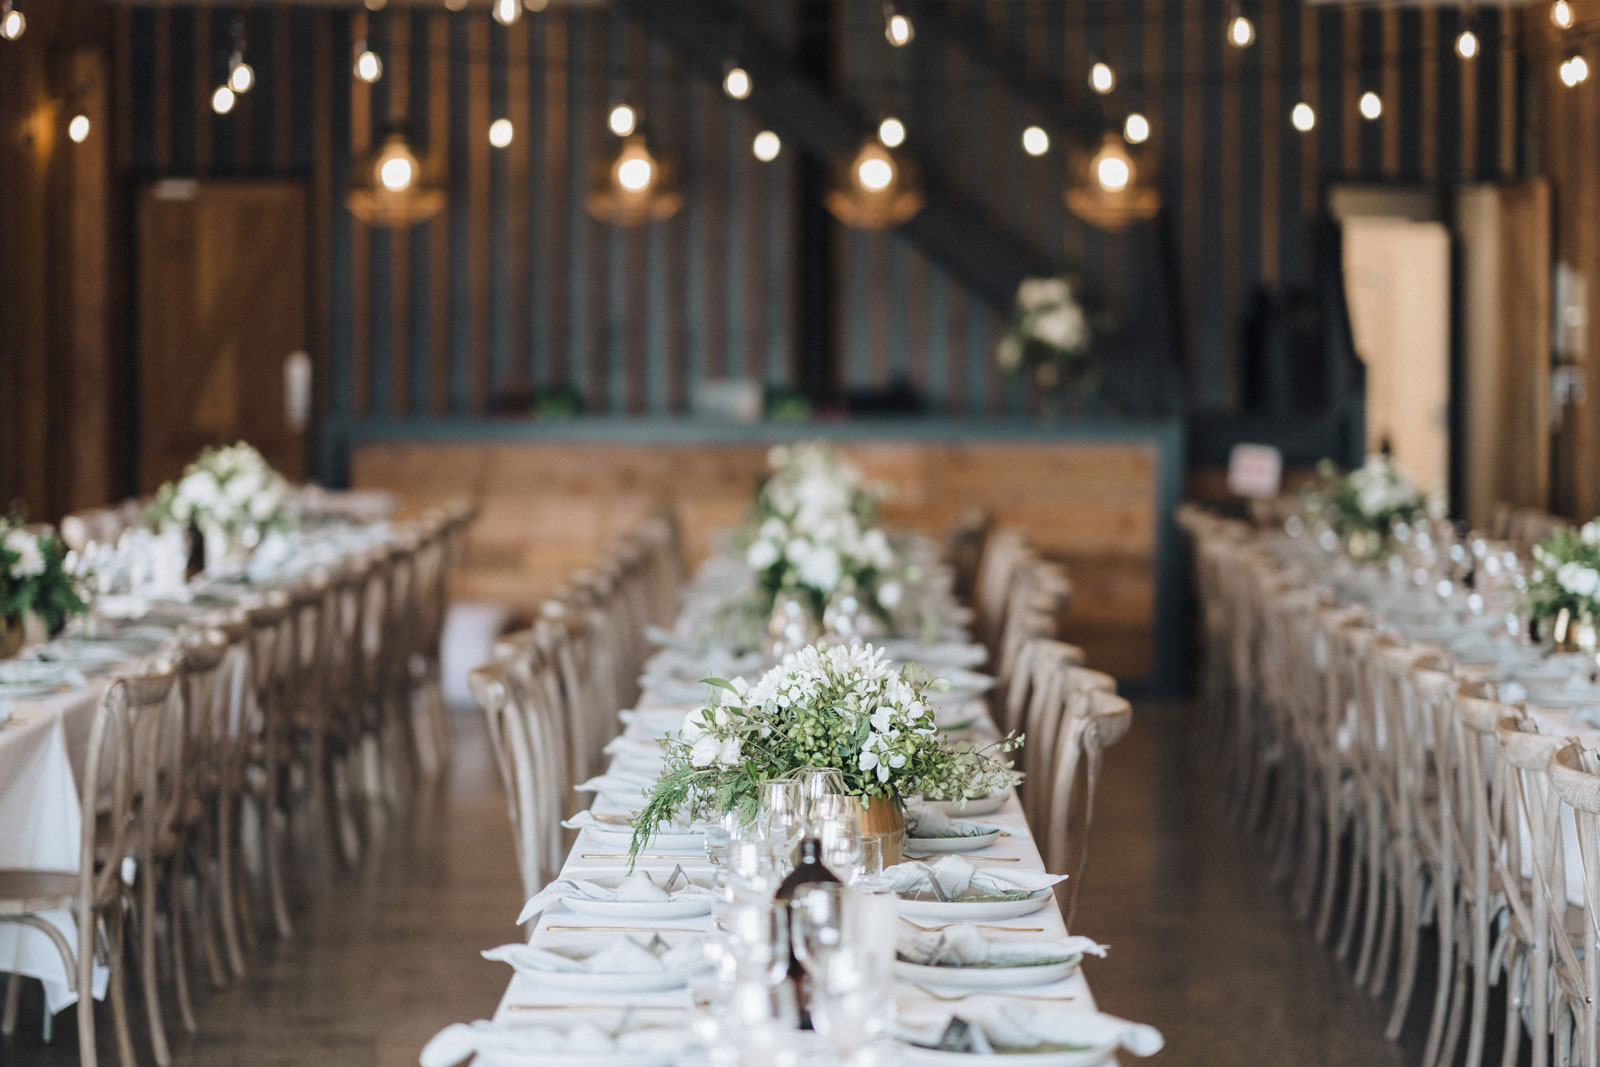 newfound-n-w-black-barn-tarawera-rotorua-wedding-photographer-427